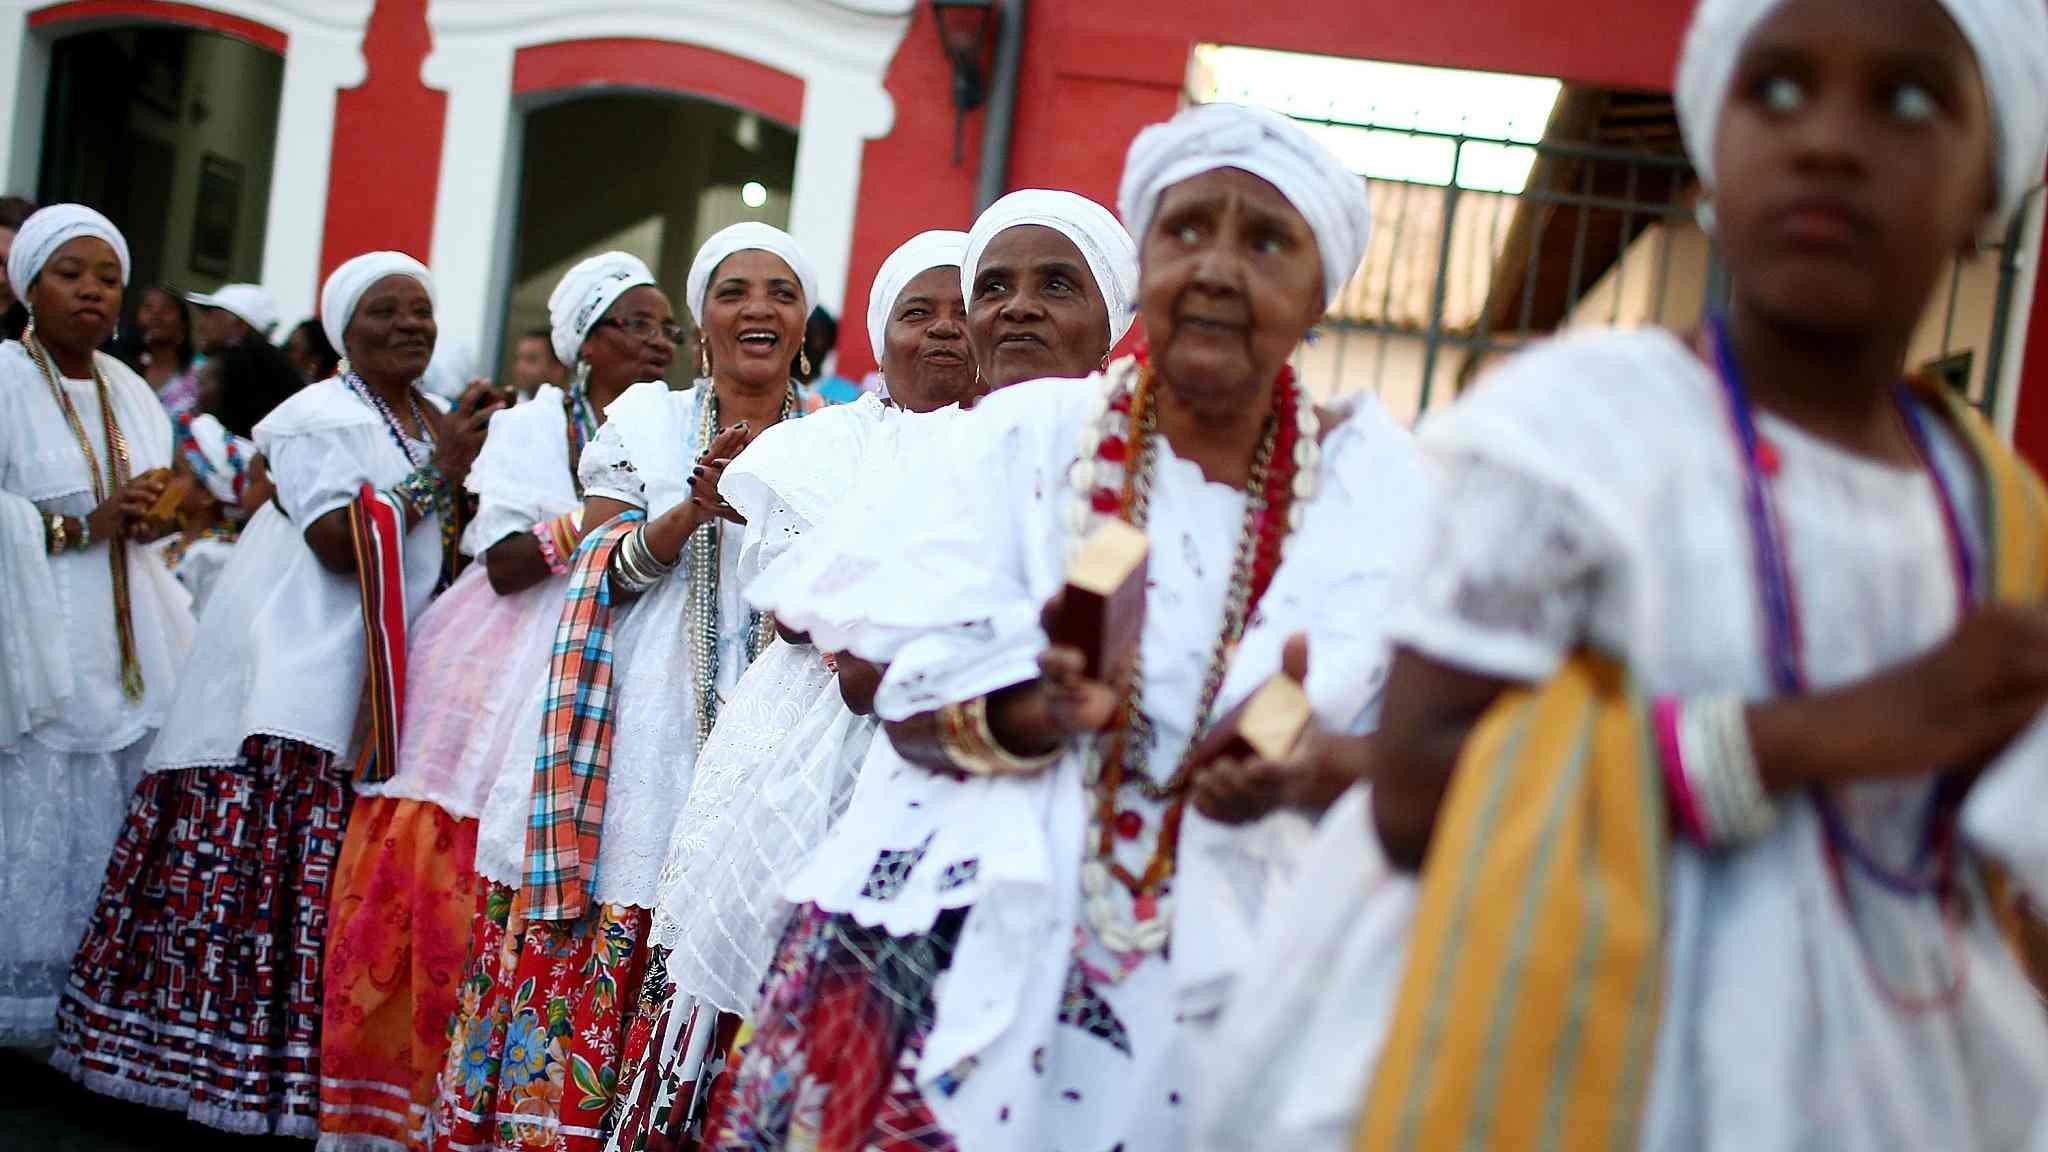 Latin America's Afro-descendants make gains but hurdles remain: report